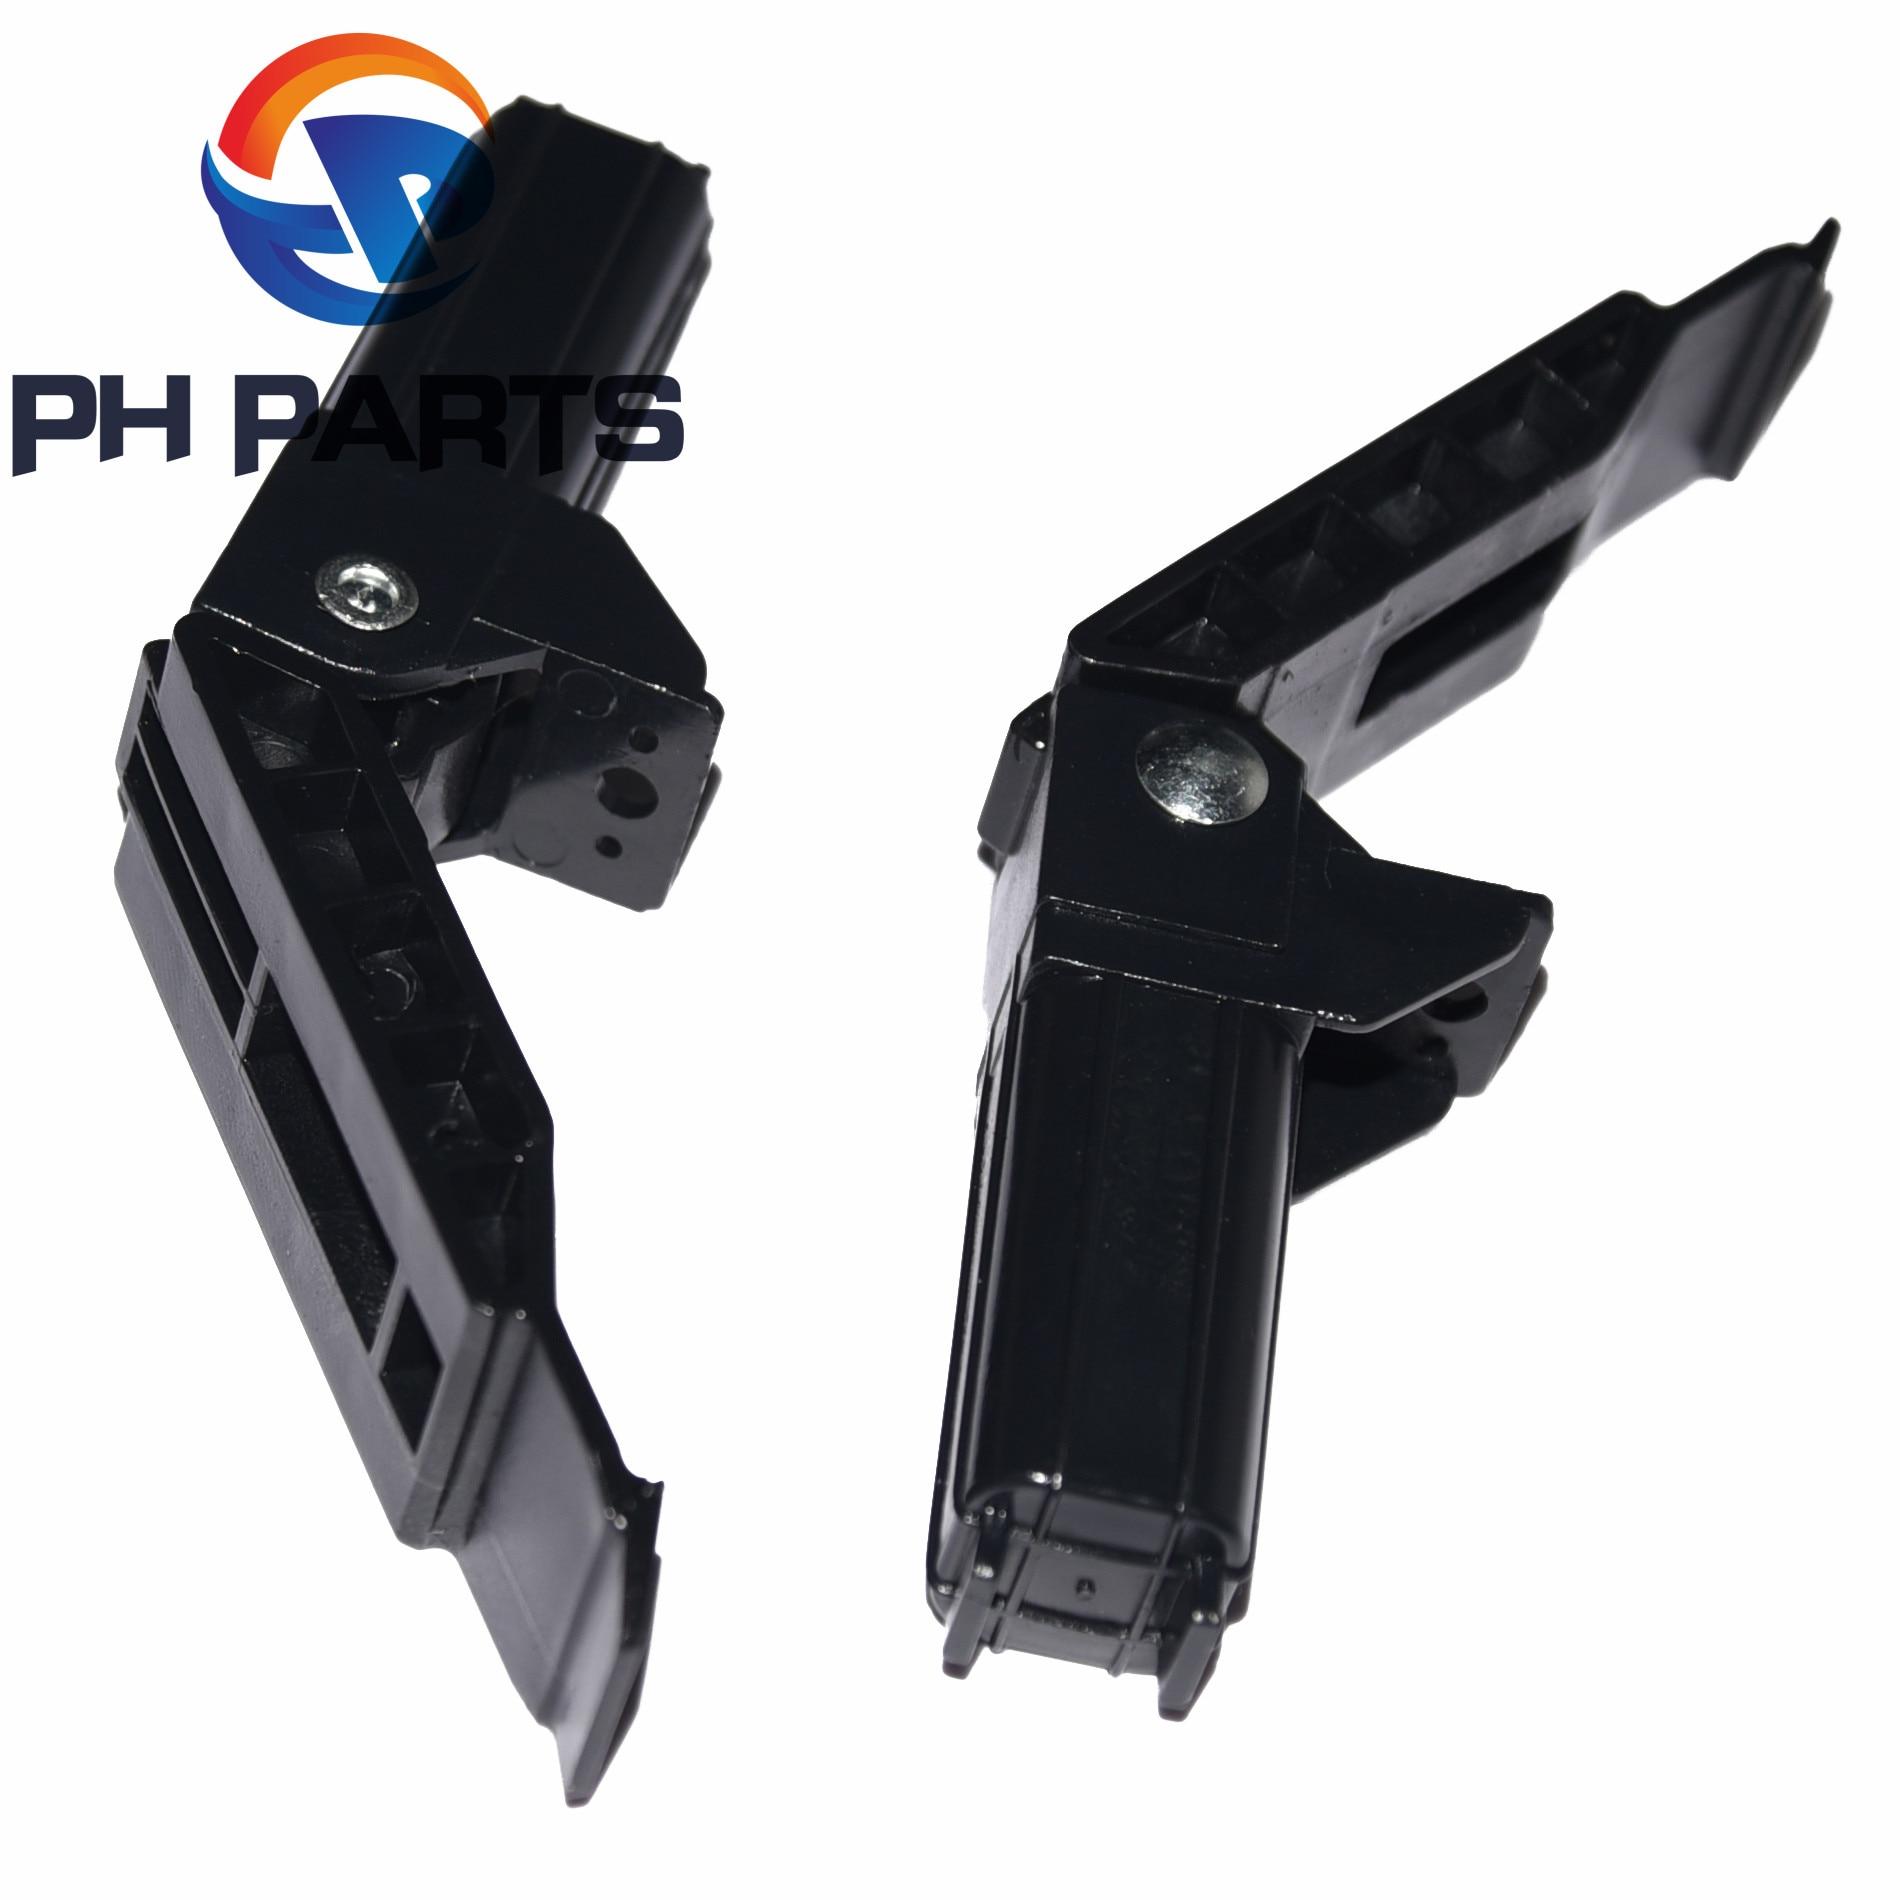 10PC ADF Hinge Canon D520 D560 MF4410 MF4412 MF4420 MF4430 MF4450 MF4452 MF4453